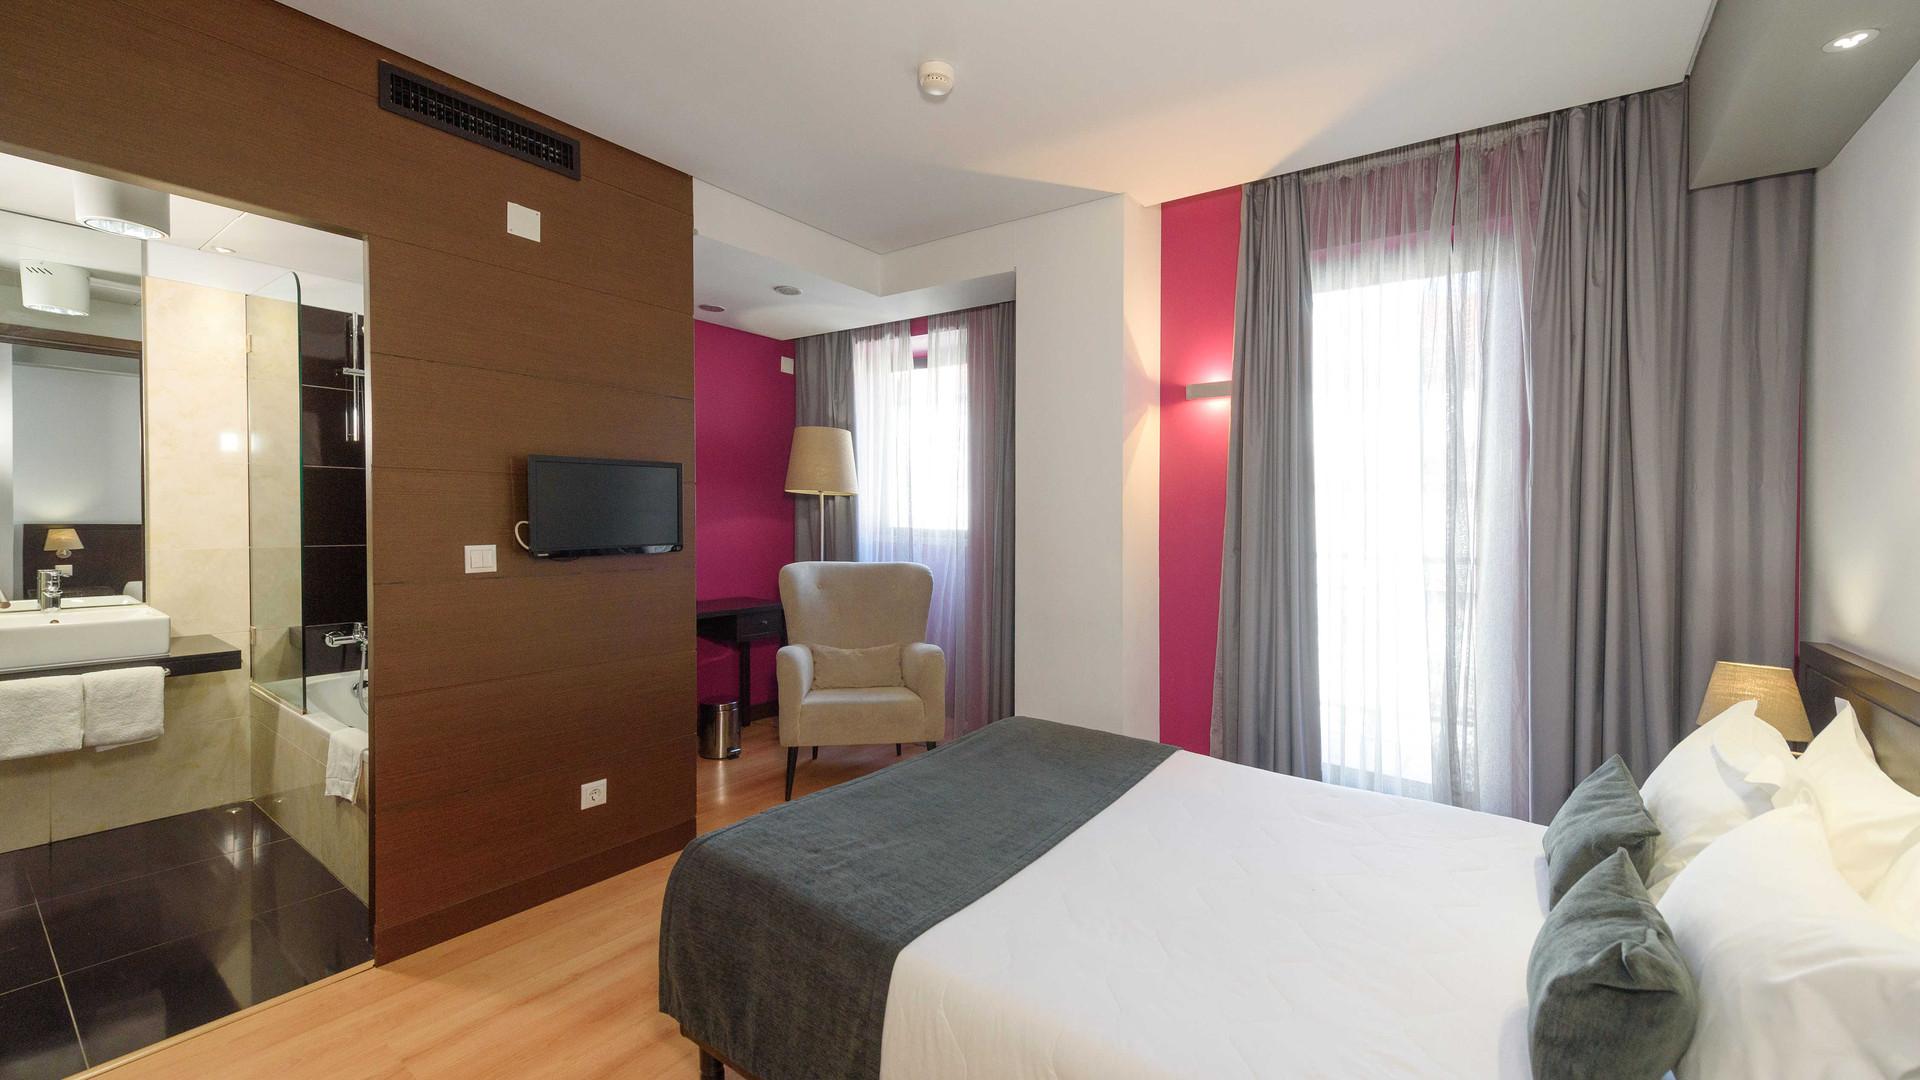 Hotel_Luena_web_1.jpg